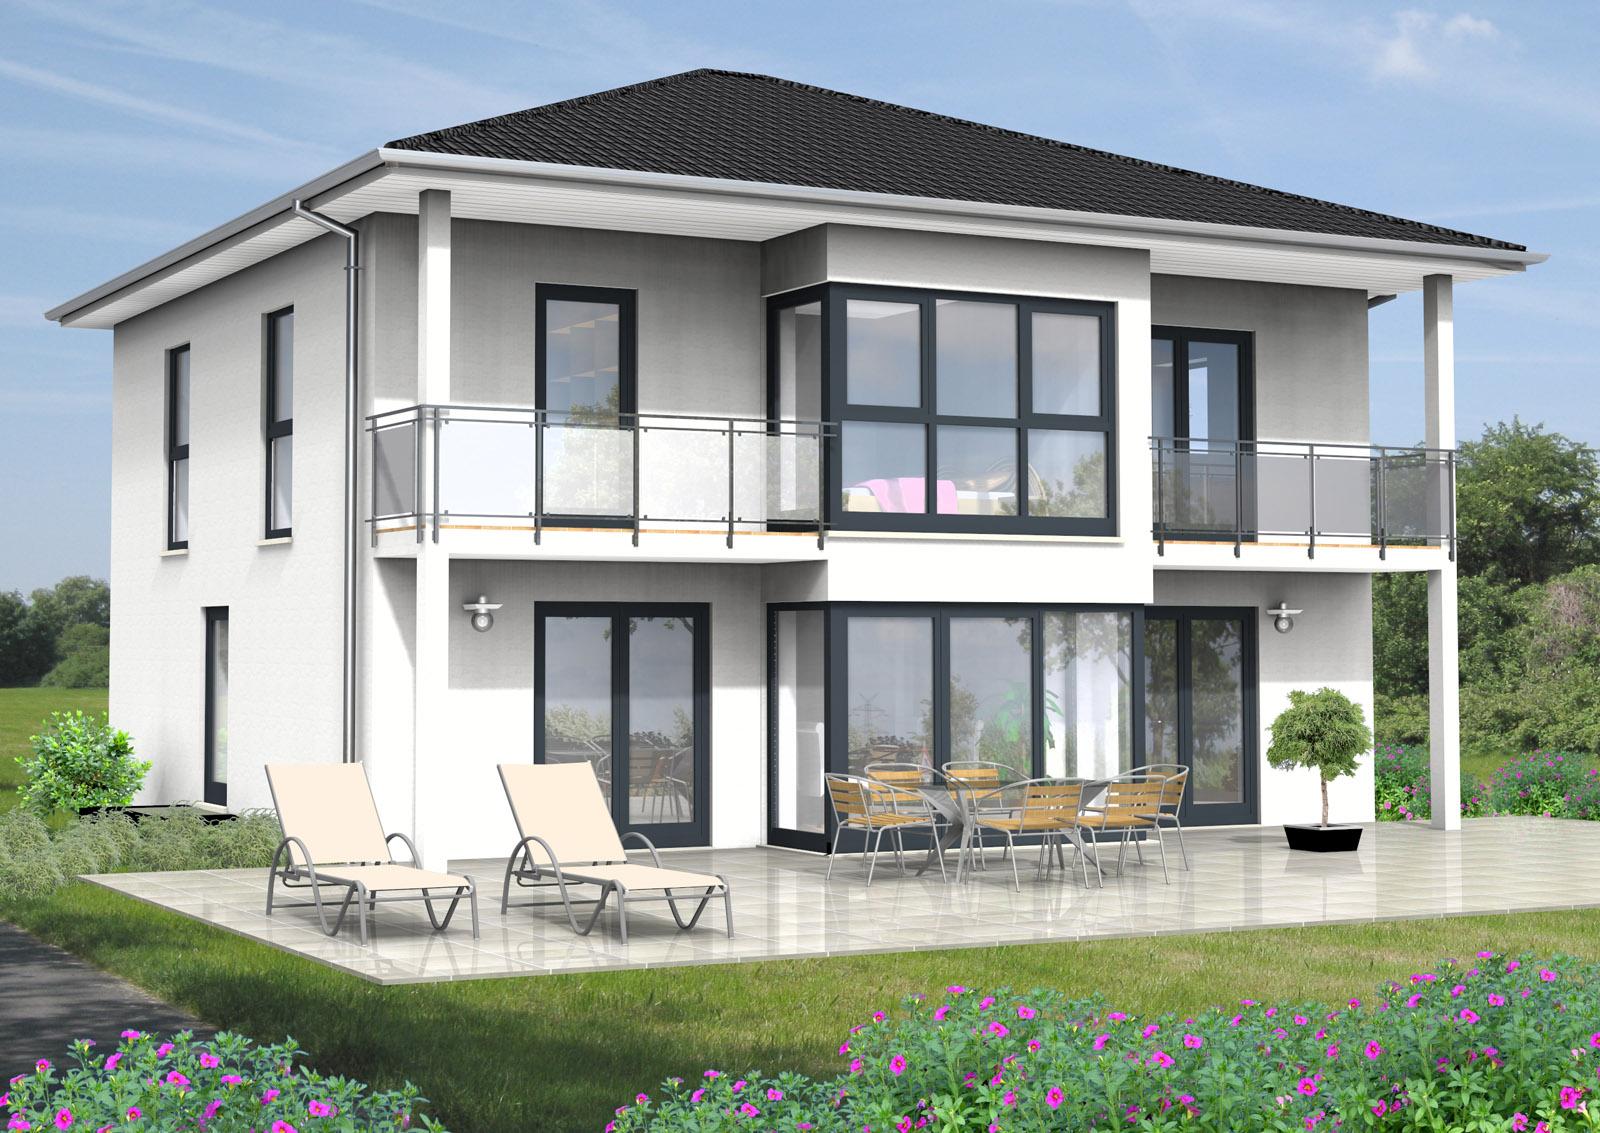 bauberatung baubetreuung baufinanzierung bauplanung stadtvilla 170 m. Black Bedroom Furniture Sets. Home Design Ideas